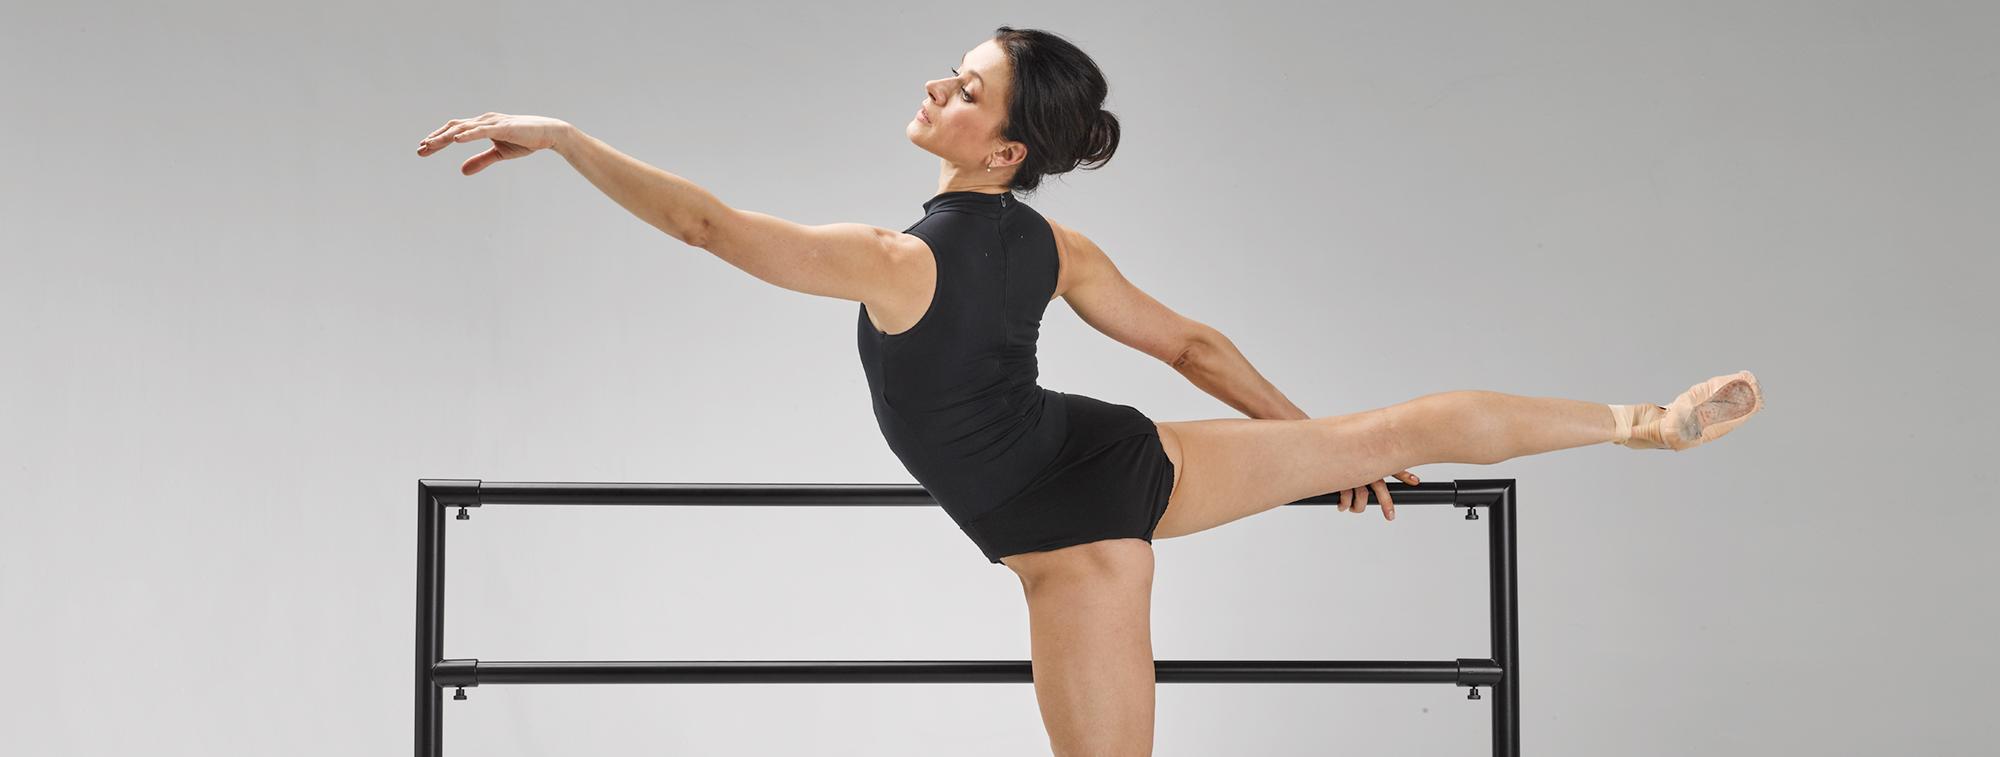 portable ballet barre image